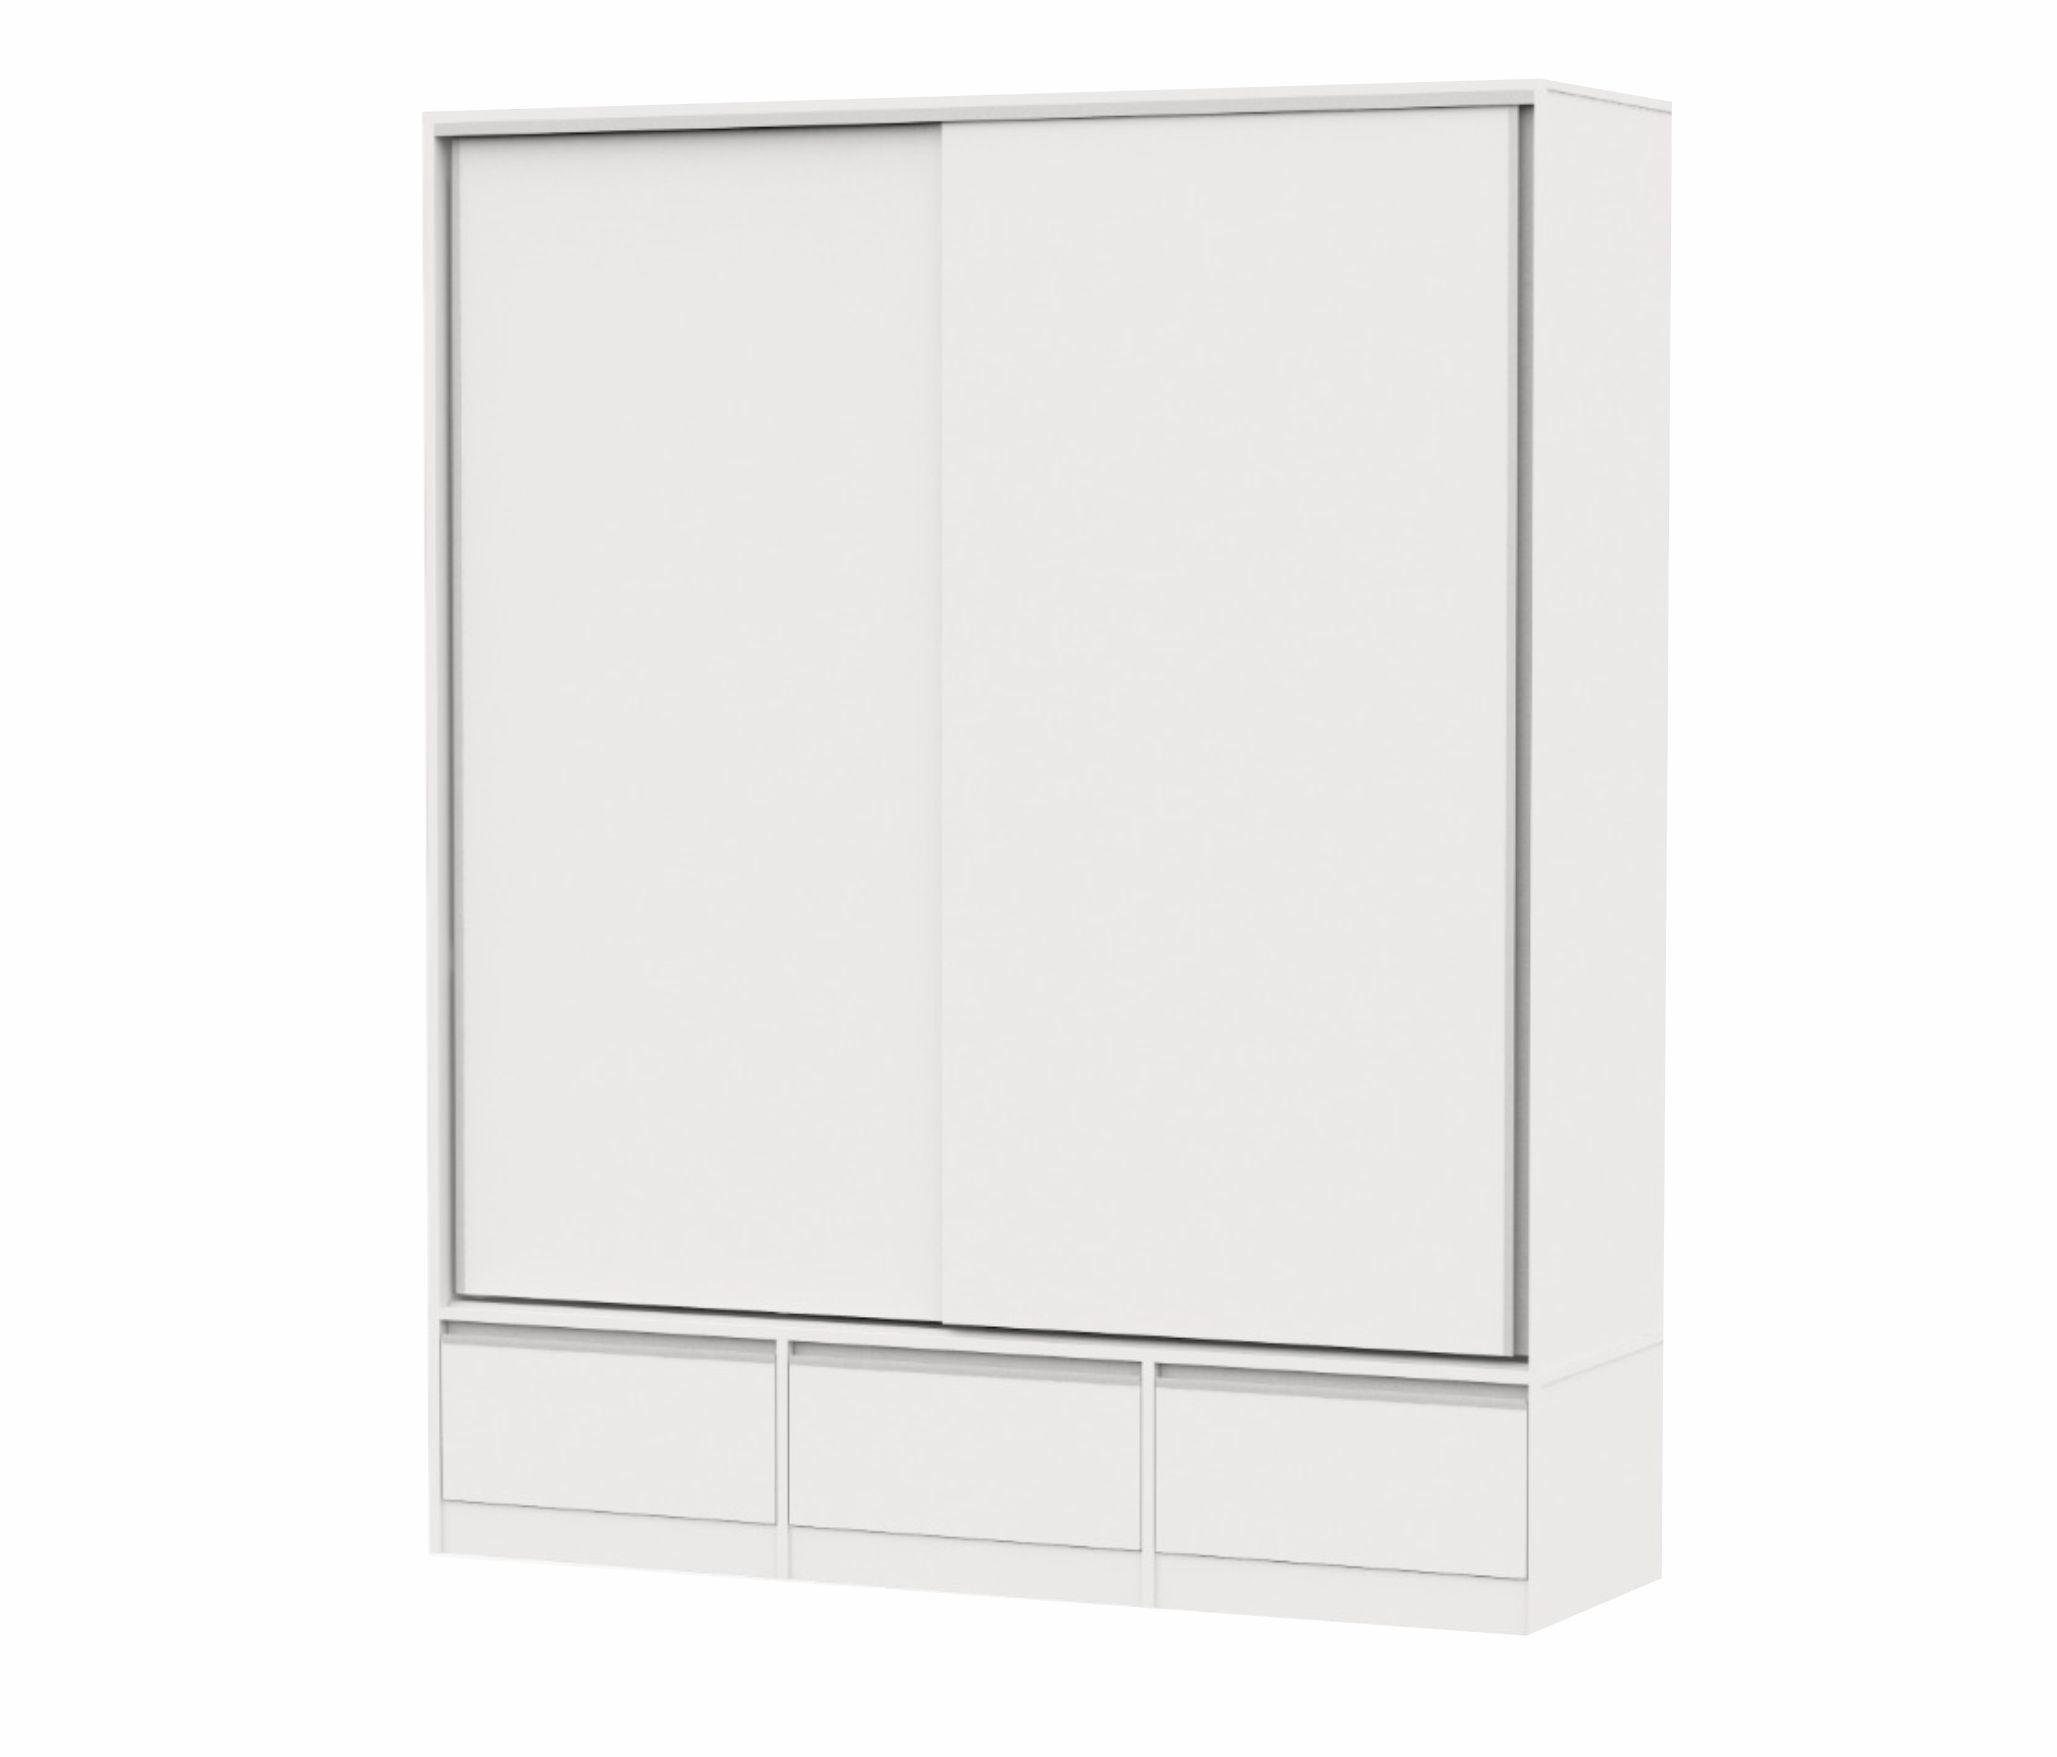 Placard Blanco 2 puertas corredizas PREMIUM